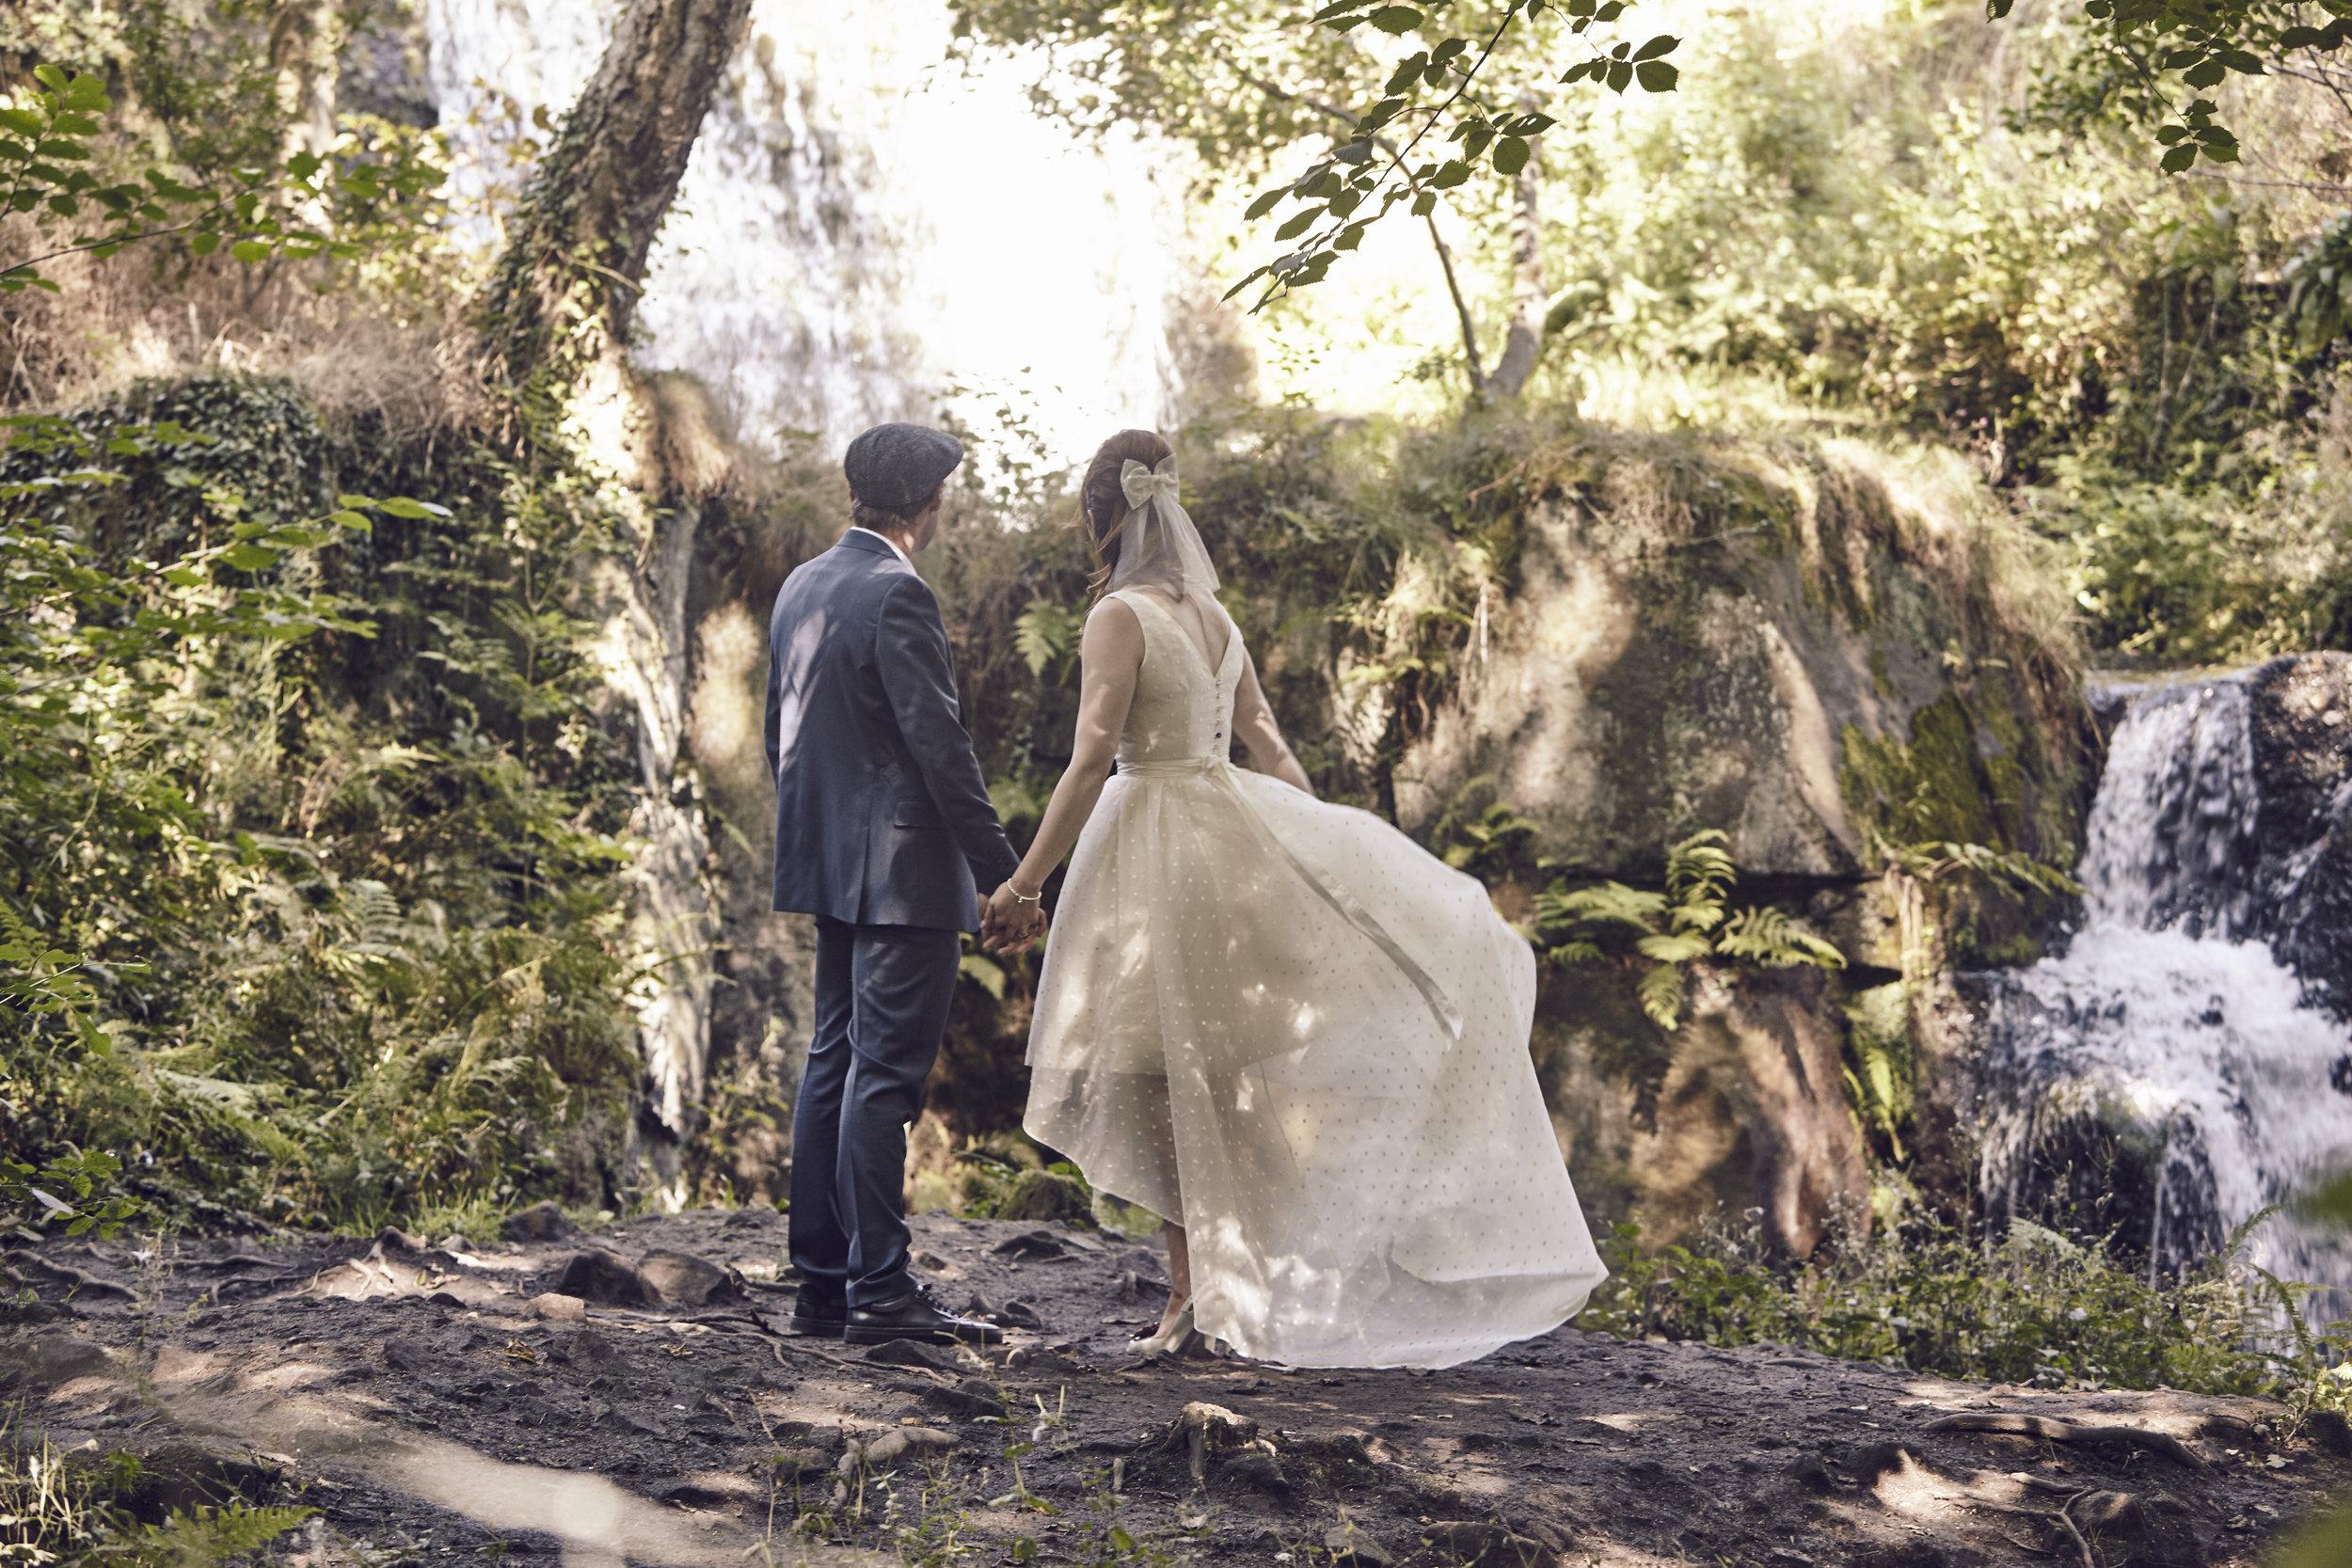 Suzi-Matlock-Polka-Dot-Bespoke-Wedding-Dress-High-Low-Susanna-Greening-Designs-Derbyshire-11